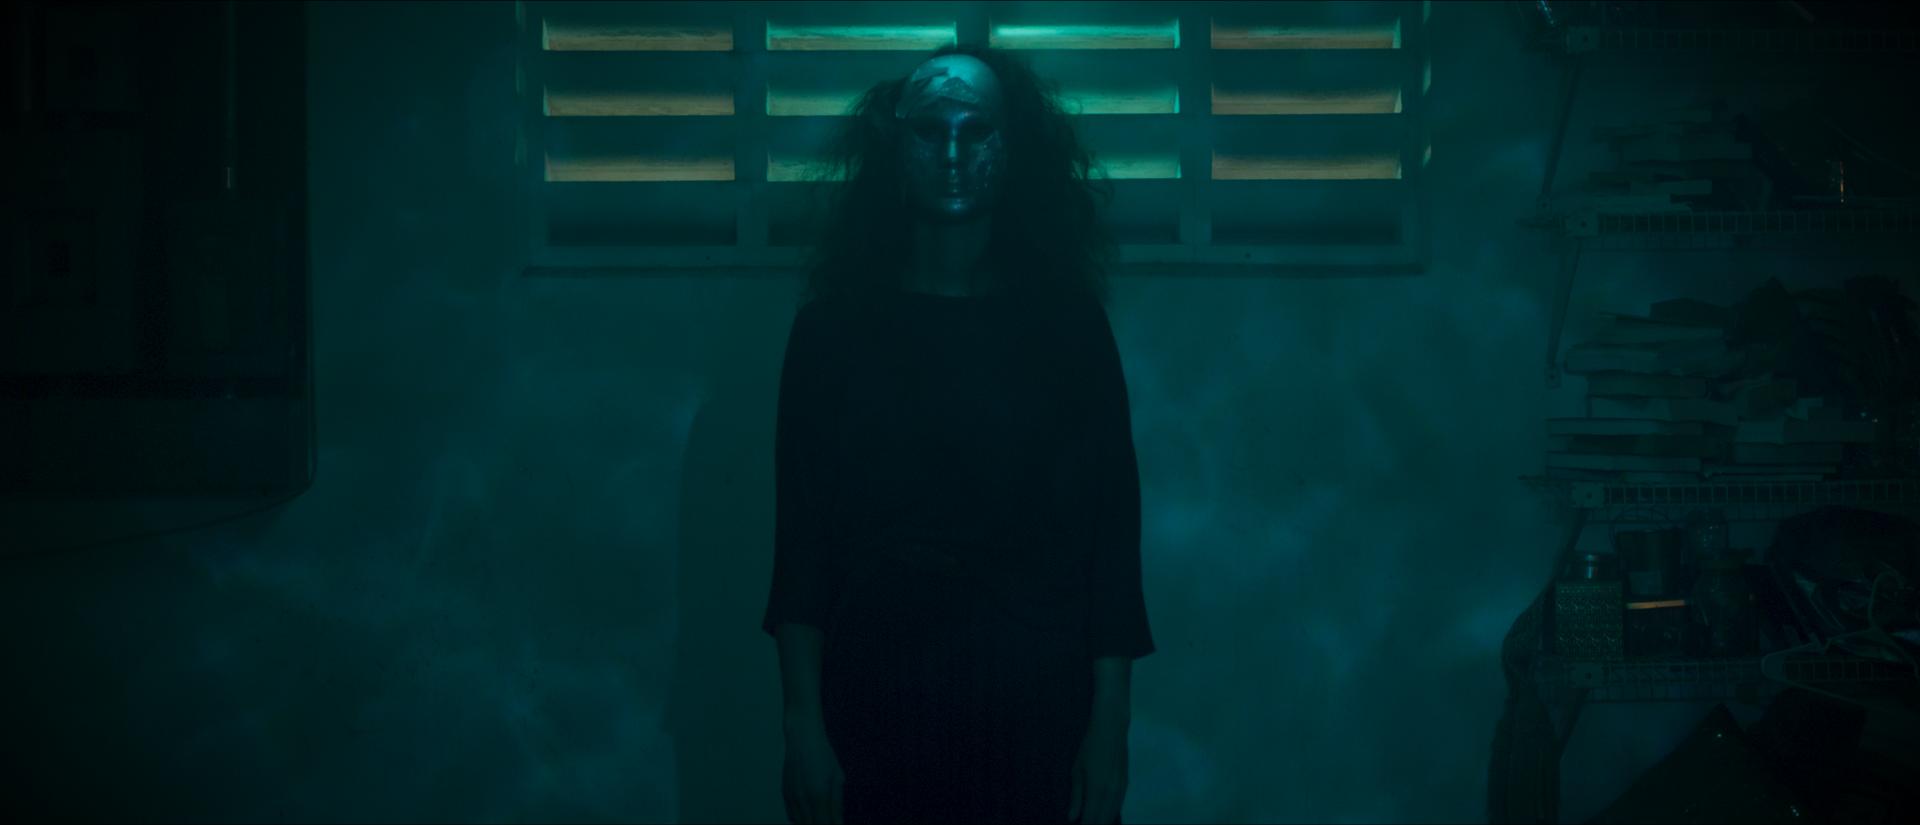 Masked Figure - Mask 1